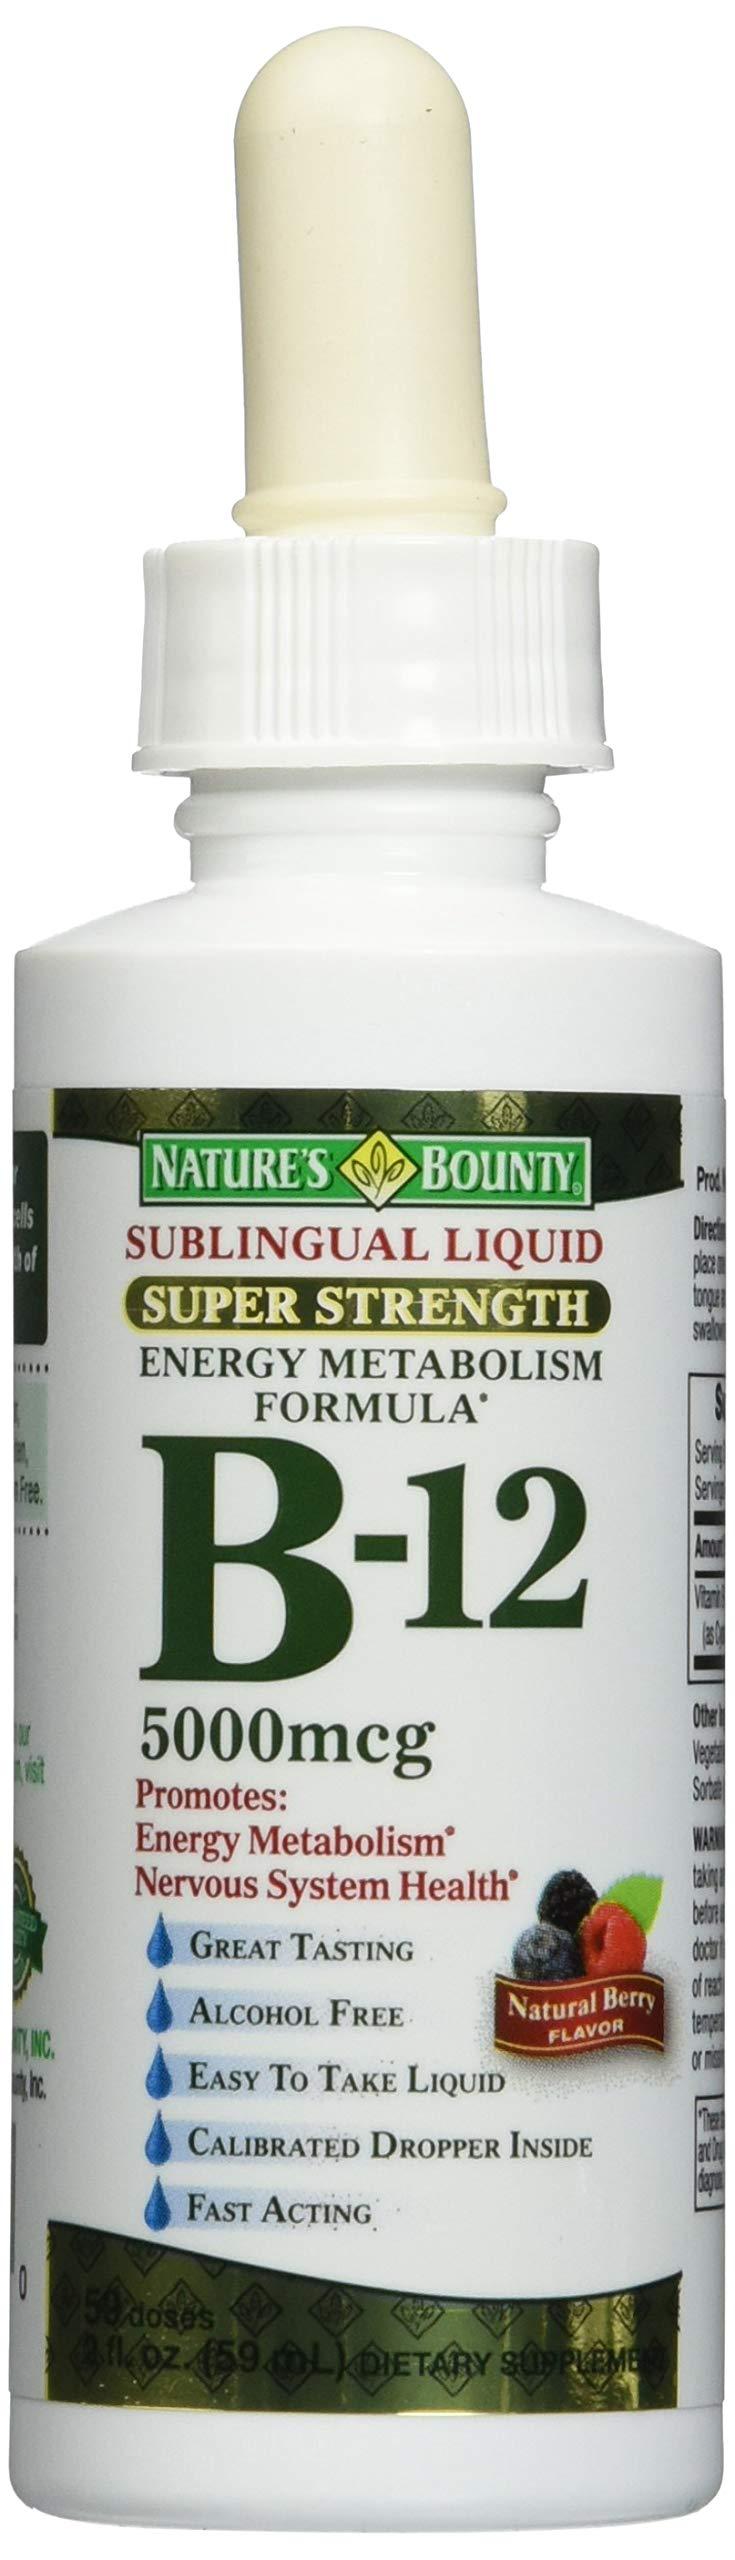 Nature's Bounty B-12 5000 mcg Sublingual Liquid Energy Health 2 oz (Pack of 3)